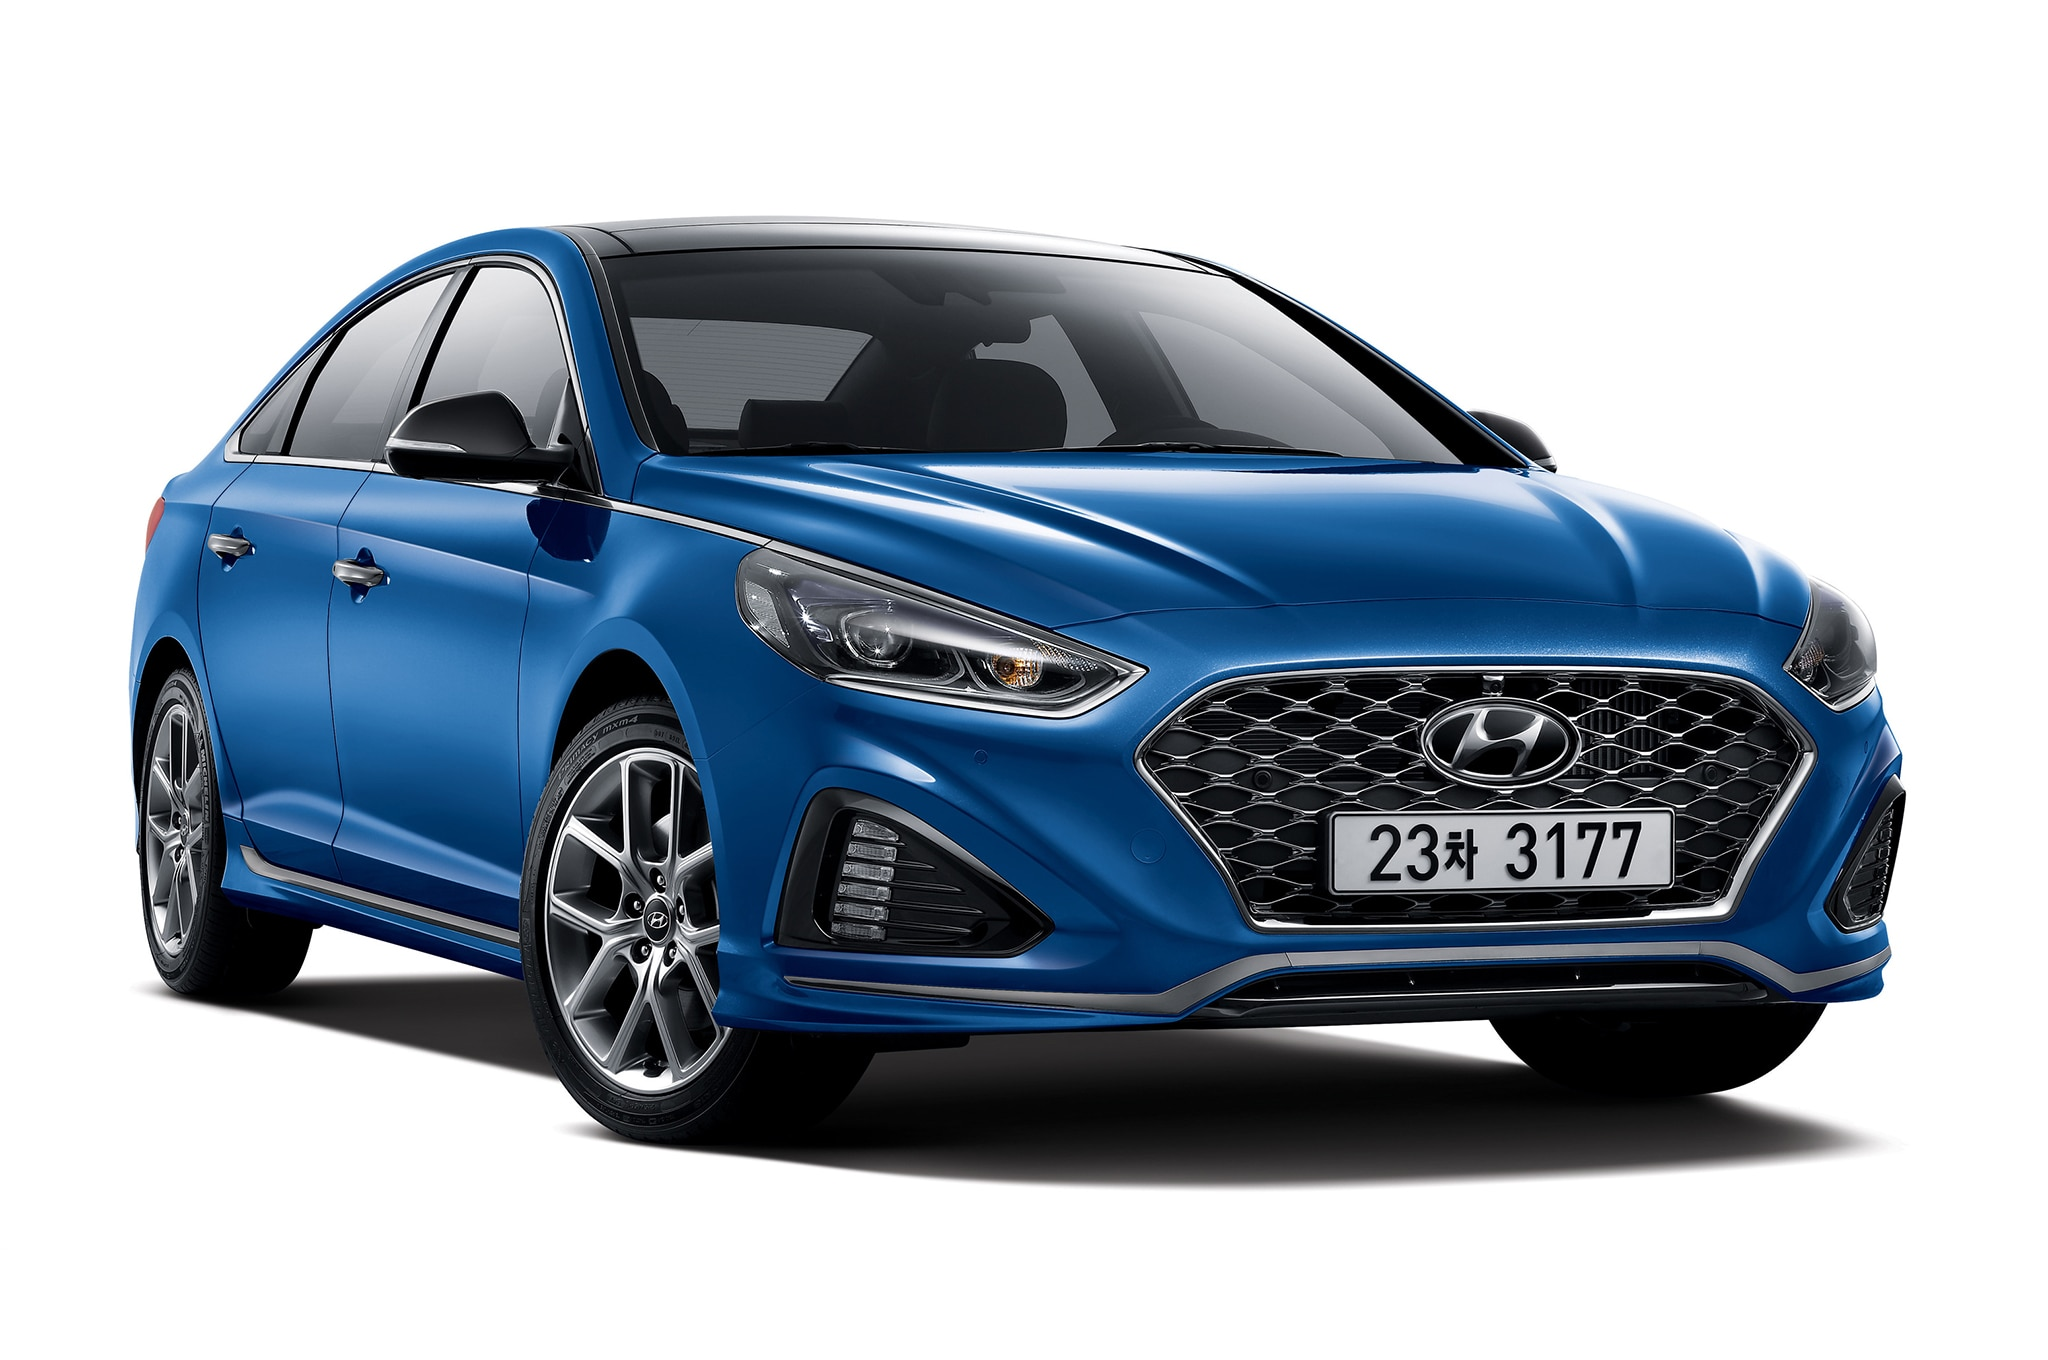 2018 Hyundai Sonata Turbo Korean Spec Front Three Quarter 1